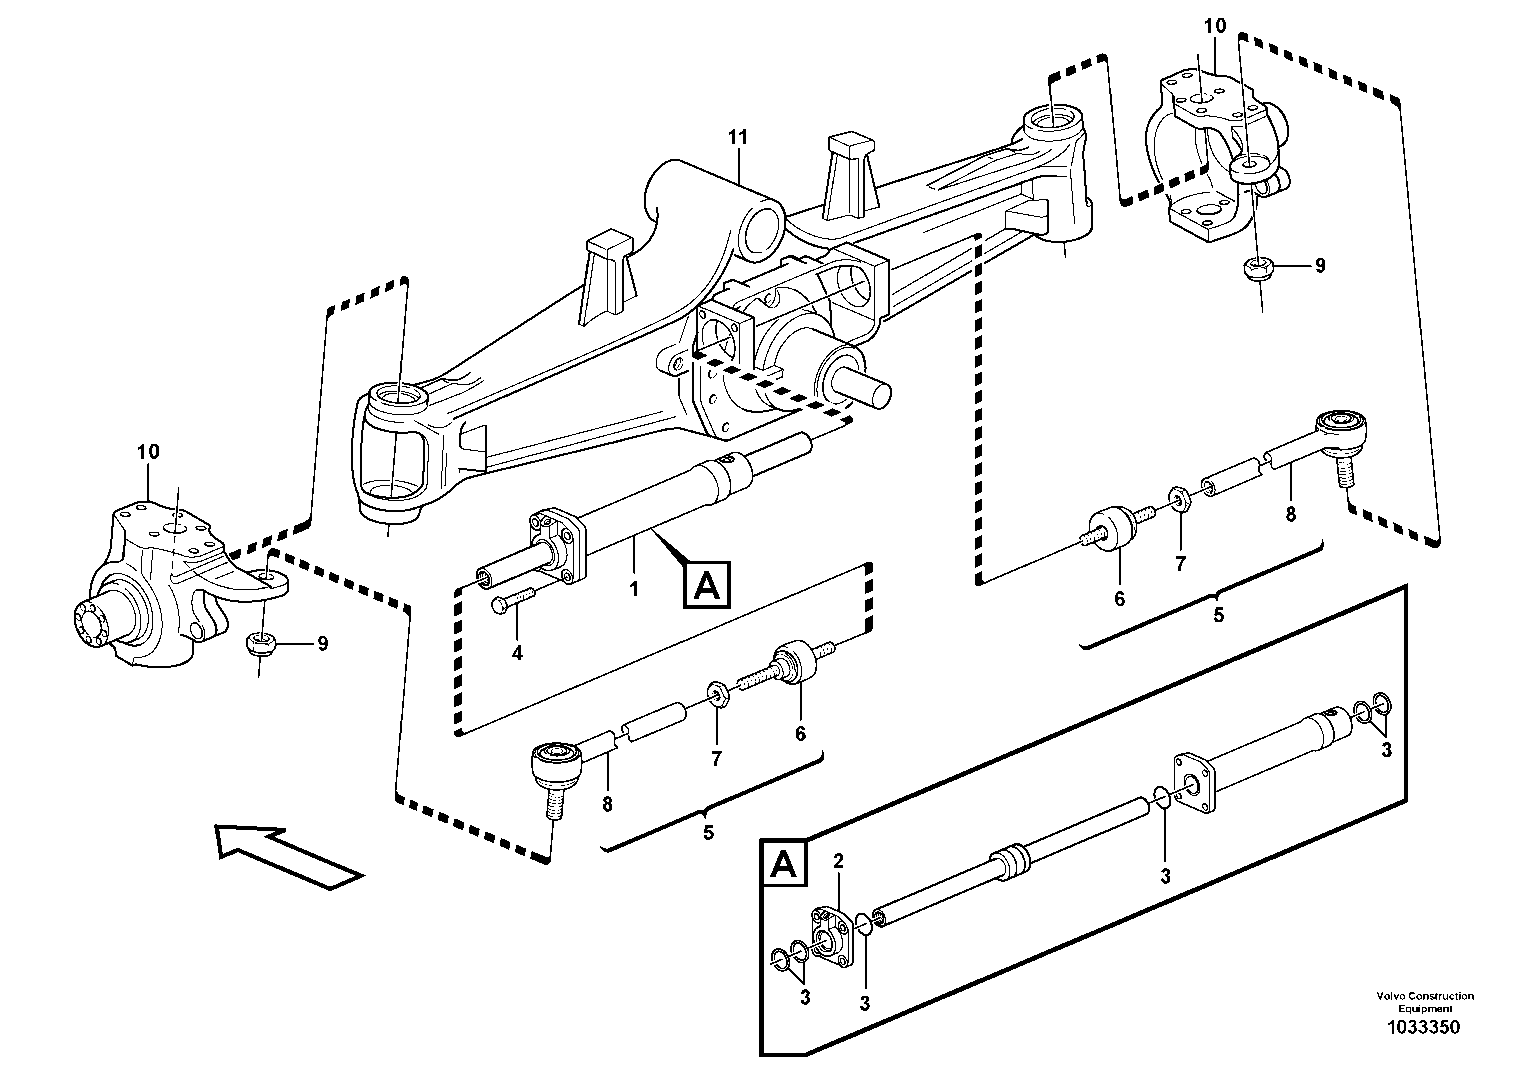 bekoloder-rot-kolu